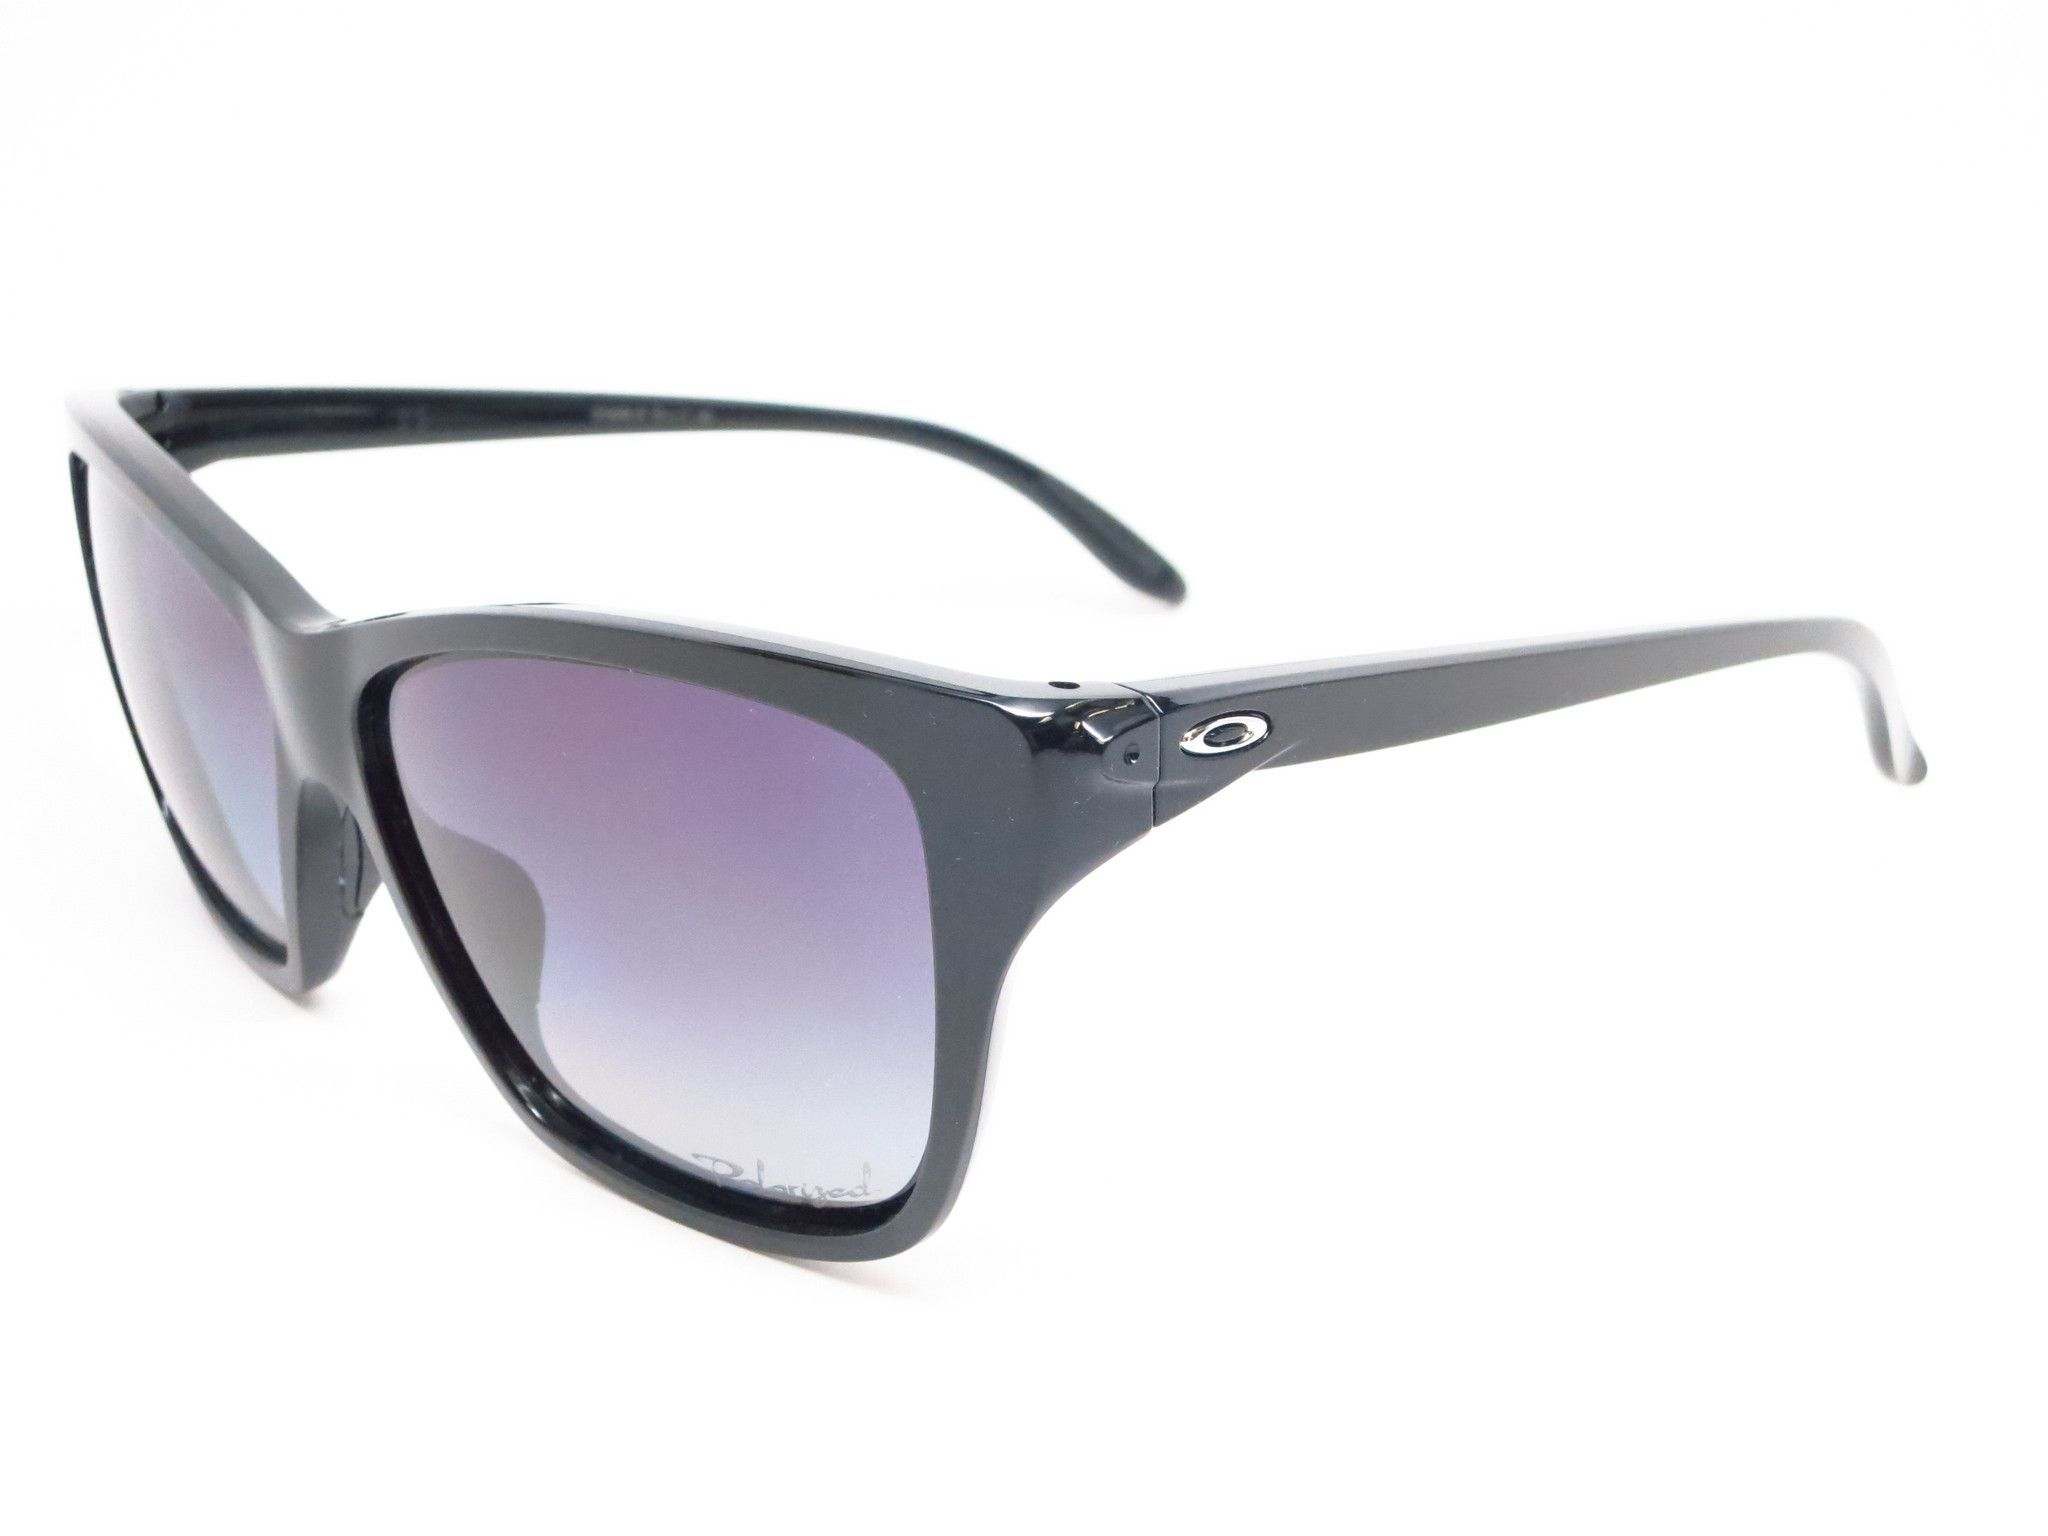 6a1416a0b7 Oakley Hold On OO9298-06 Polished Black Polarized Sunglasses ...